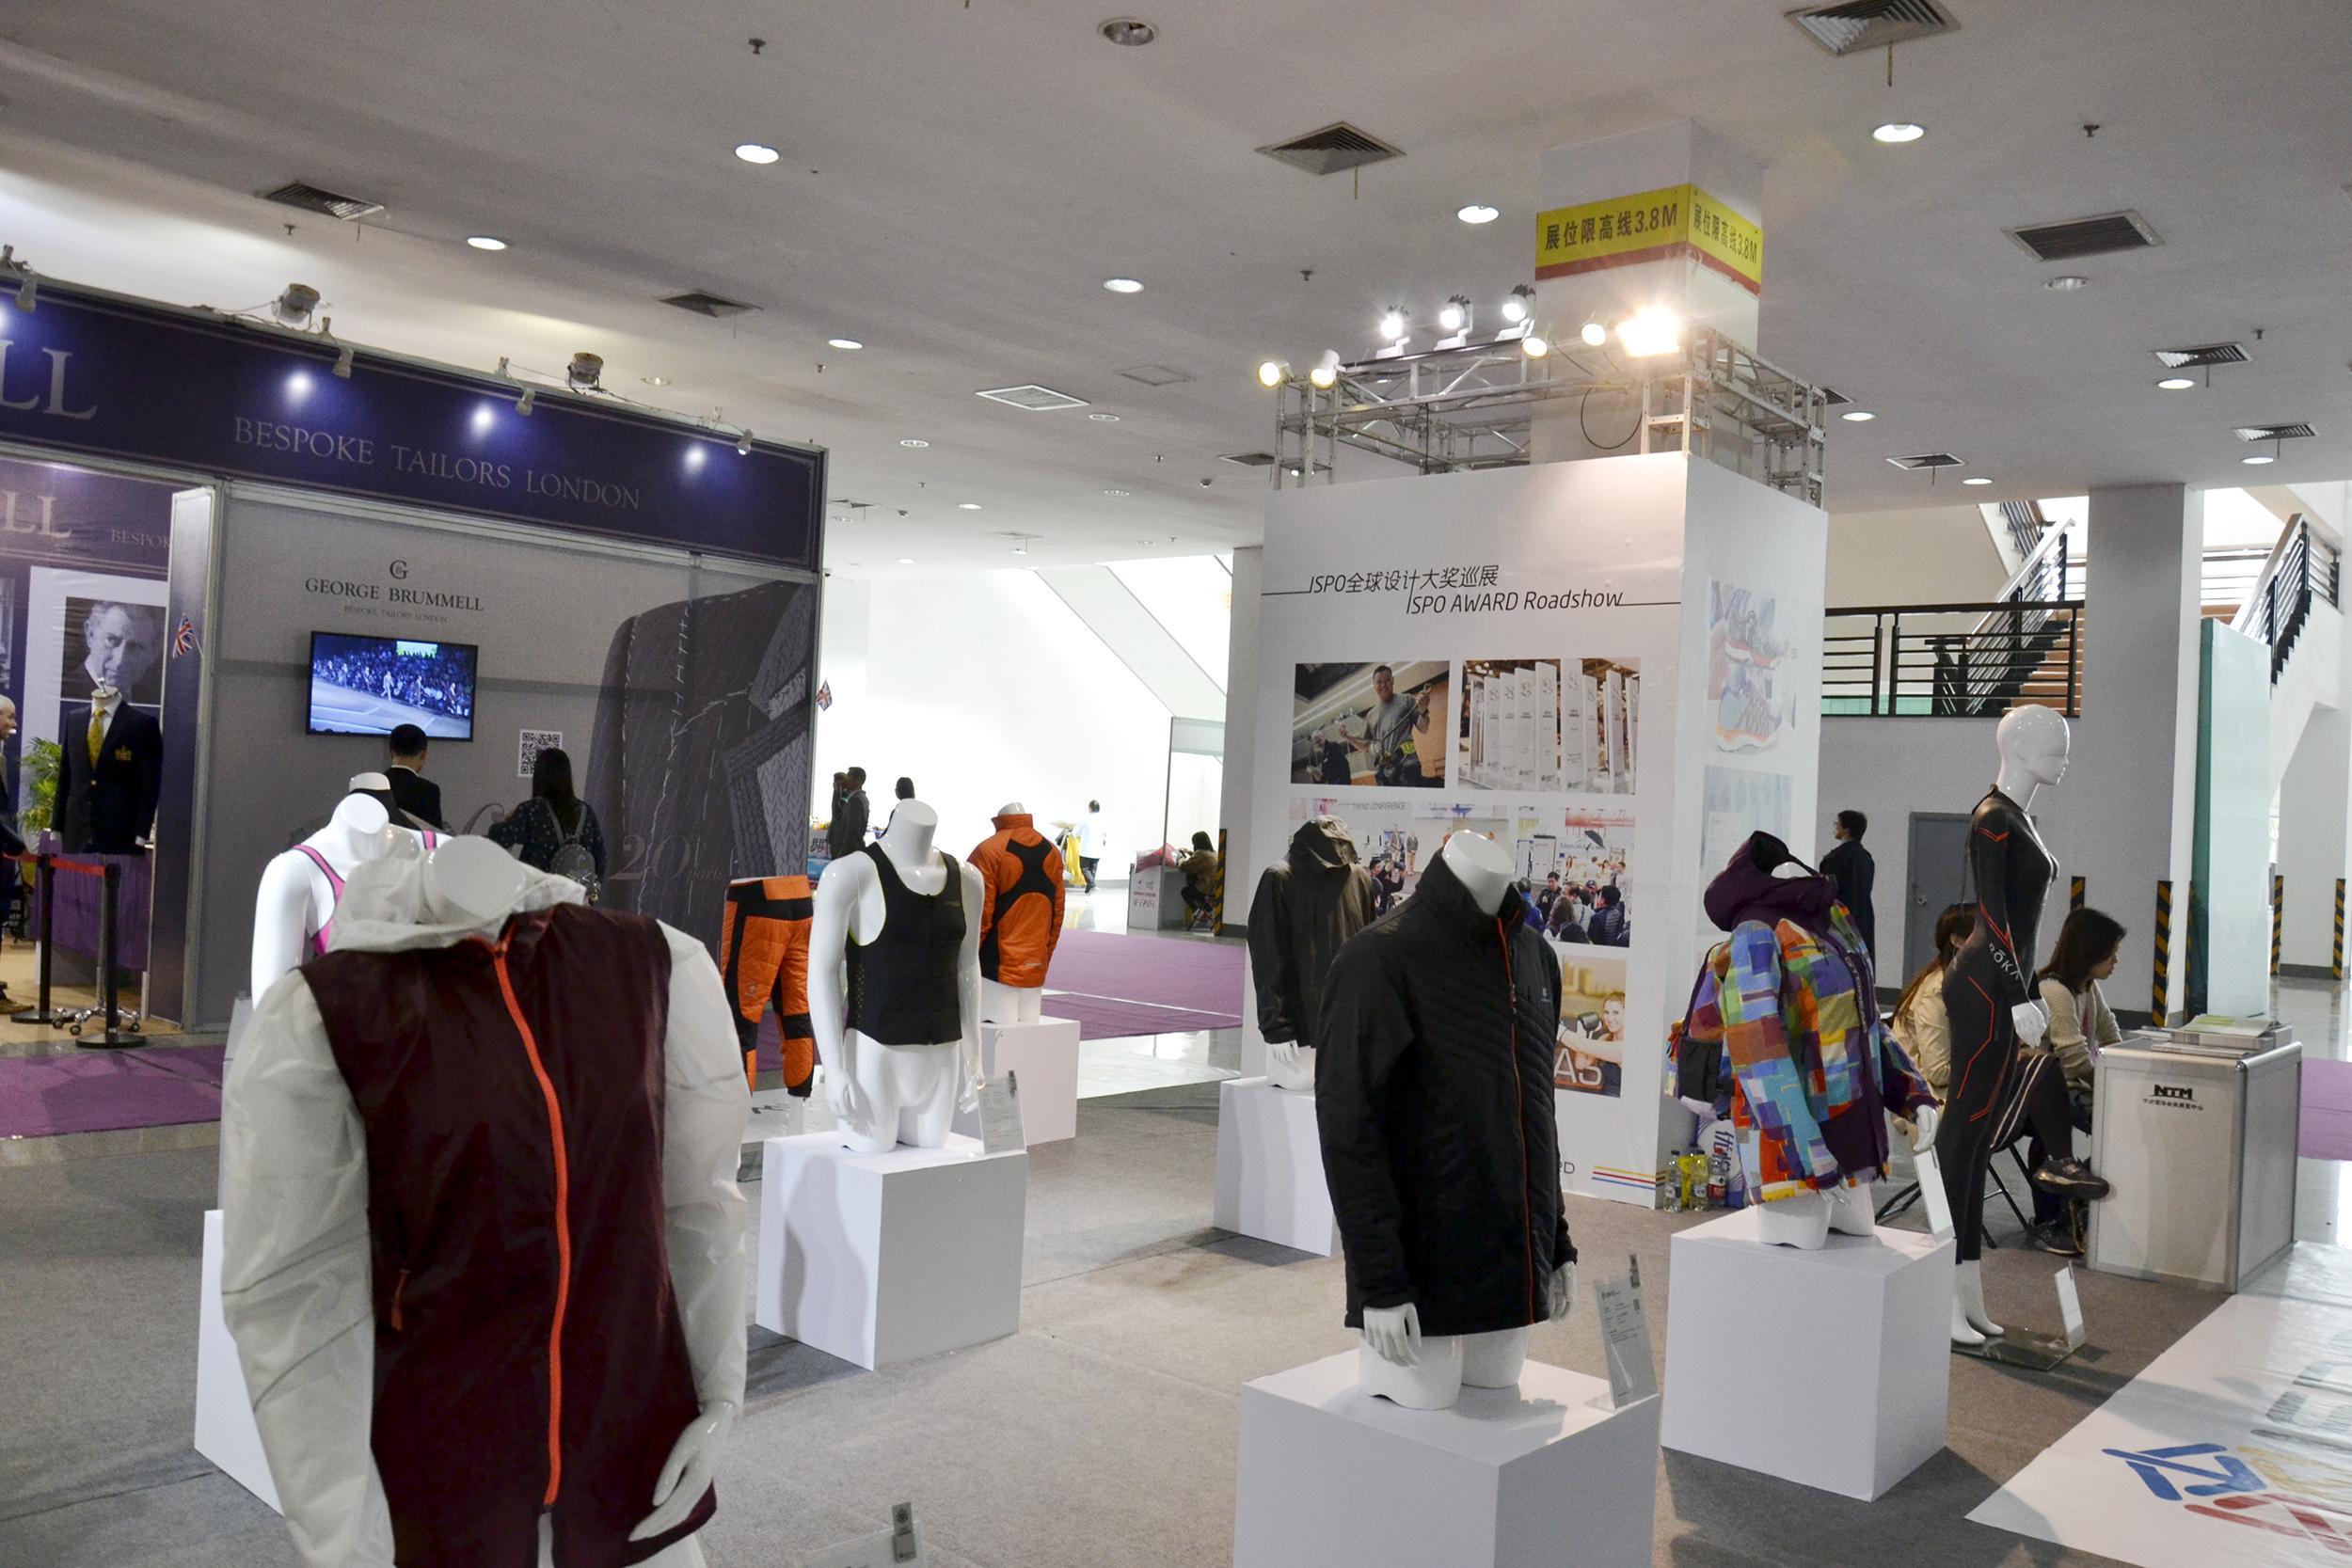 ISPO全球设计大奖巡展ISPO AWARD Roadshow亮相宁波国际服装节,还不快来大饱眼福?